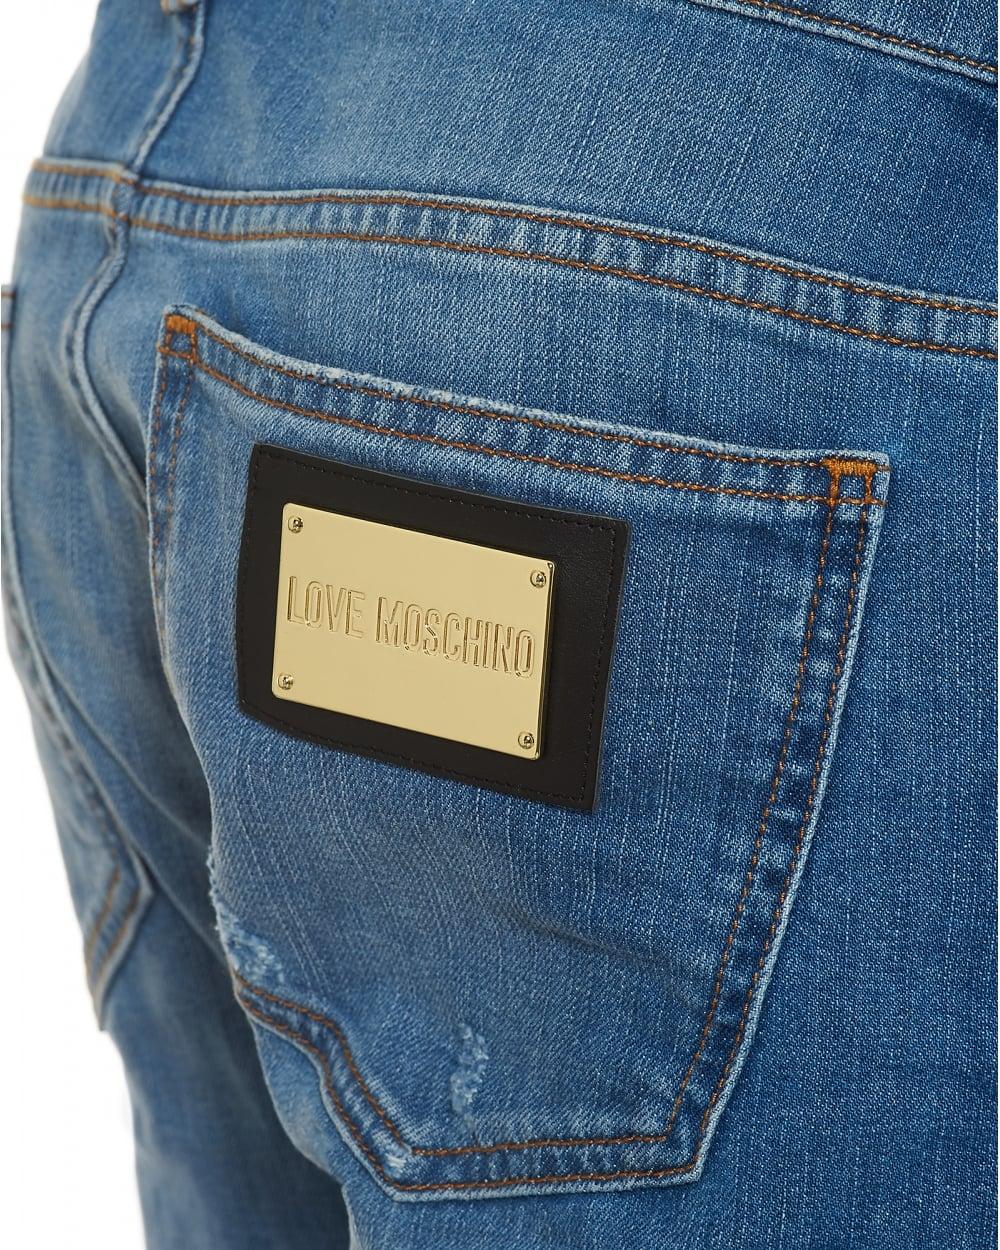 5d70cb0a45 Mens Slim Fit Distressed Jeans, Gold Hardware Light Blue Jeans